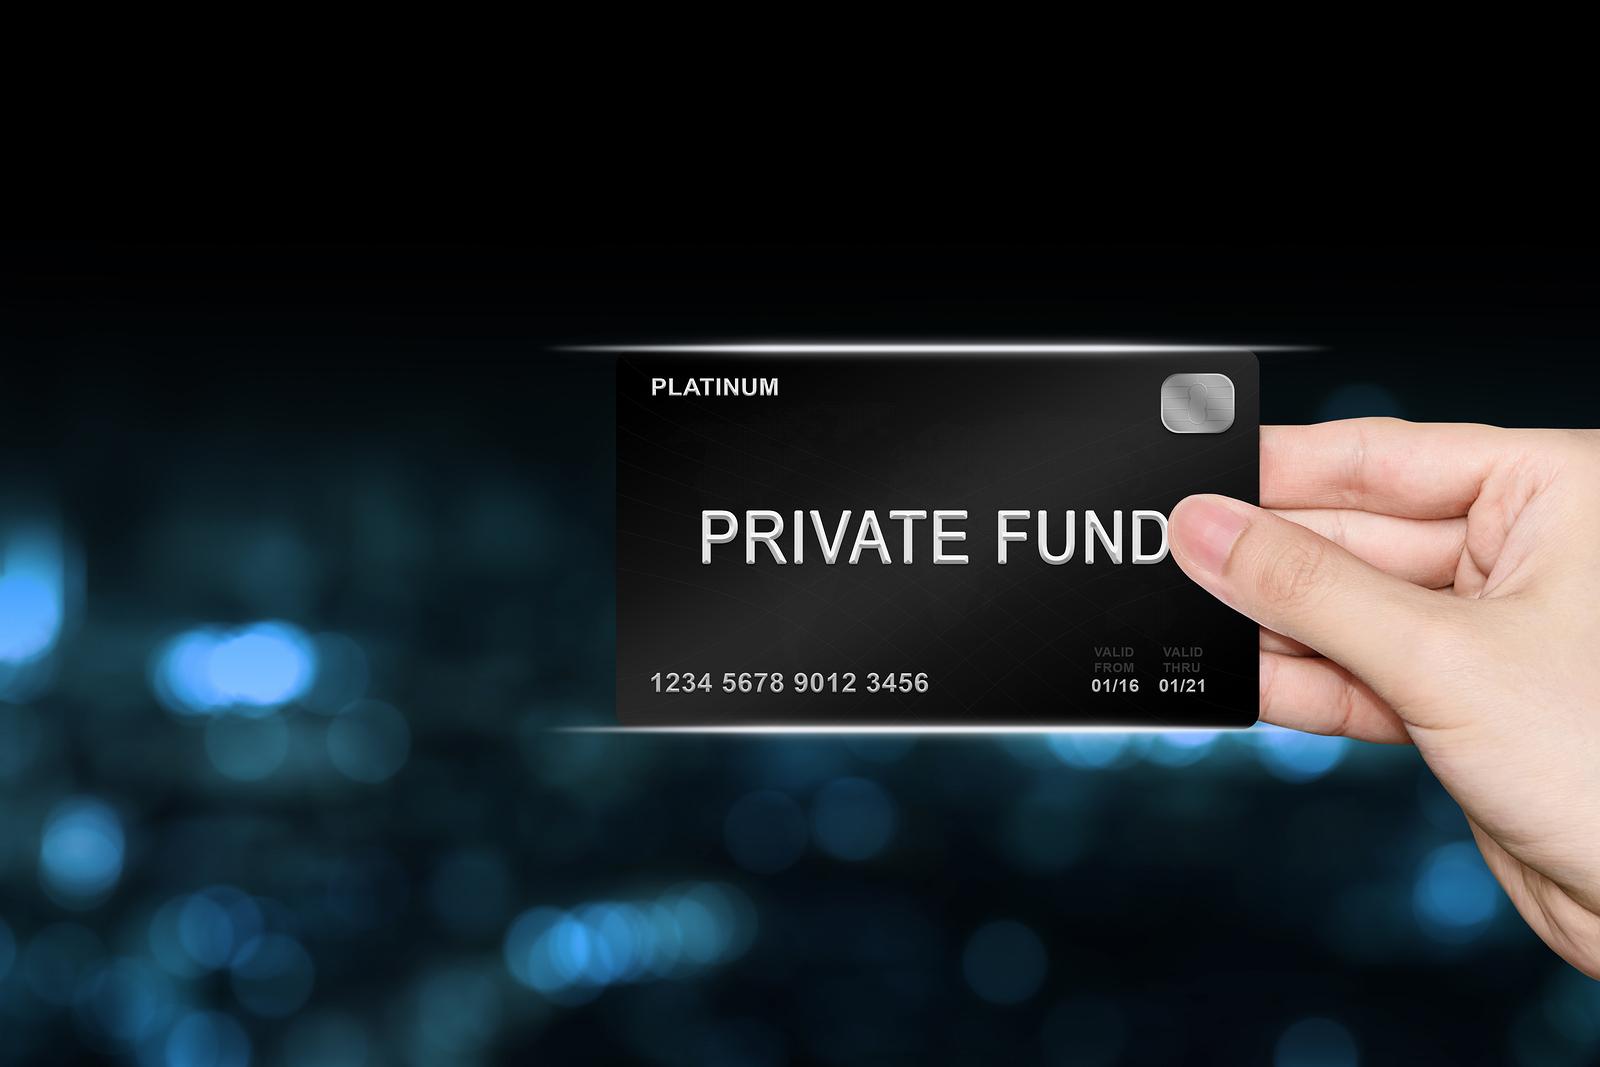 hand picking private fund platinum card on blur background